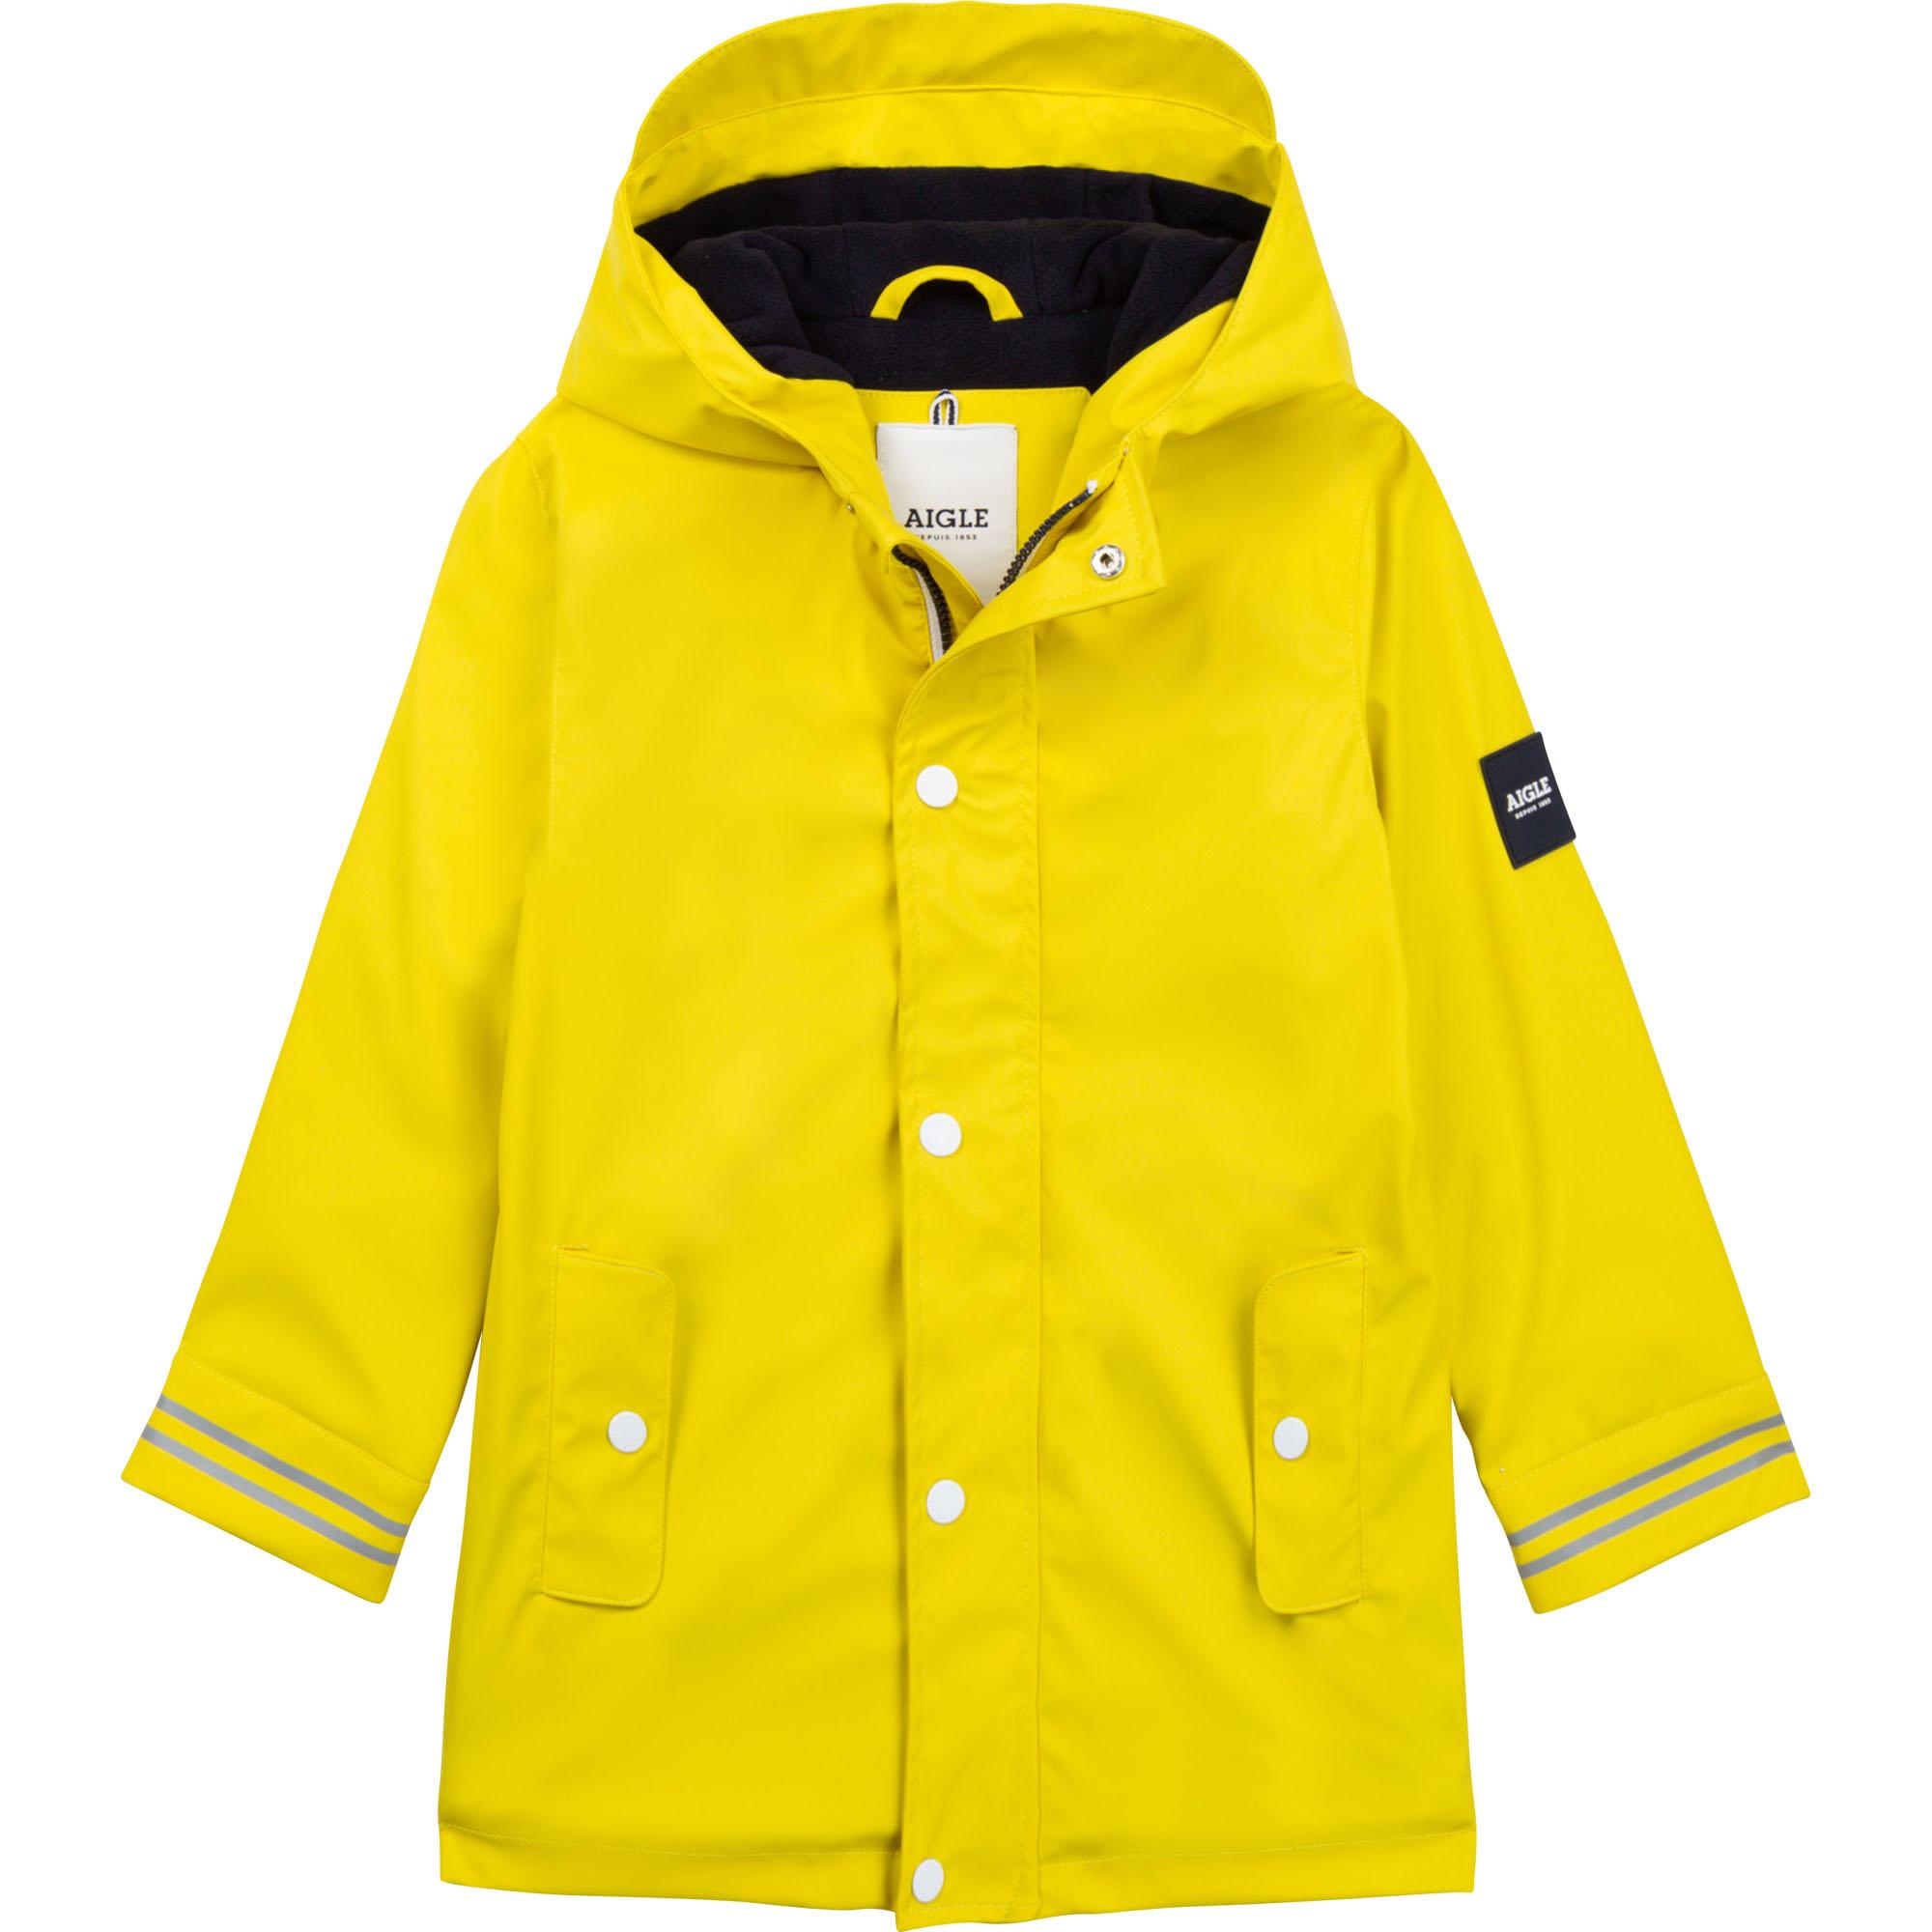 Water-resistant rain jacket AIGLE for UNISEX